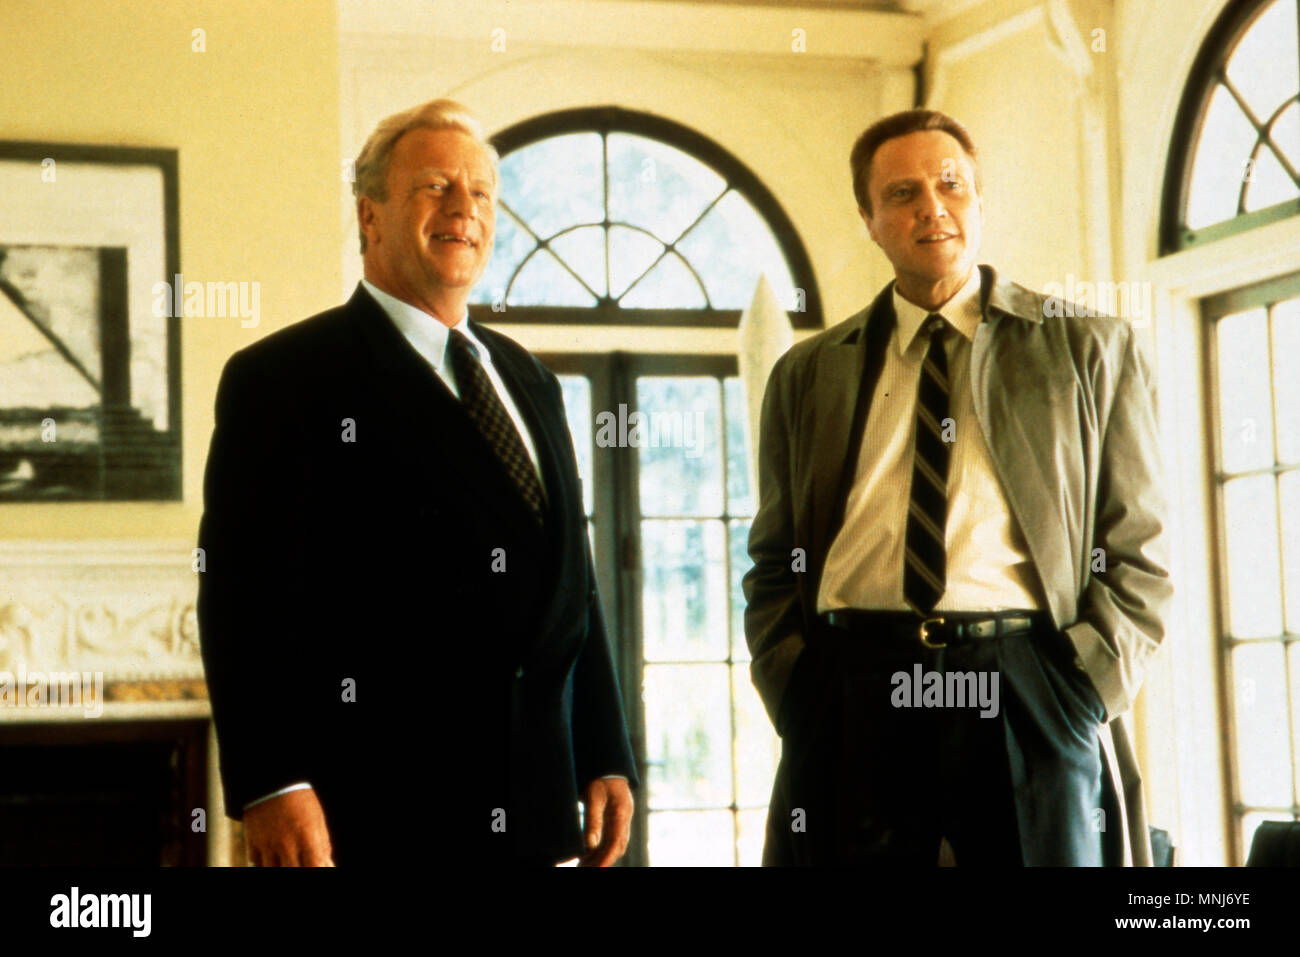 Excess Baggage, aka: Ärger im Gepäck, USA 1997, Regie: Marco Brambilla, Darsteller: Jack Thompson, Christopher Walken - Stock Image